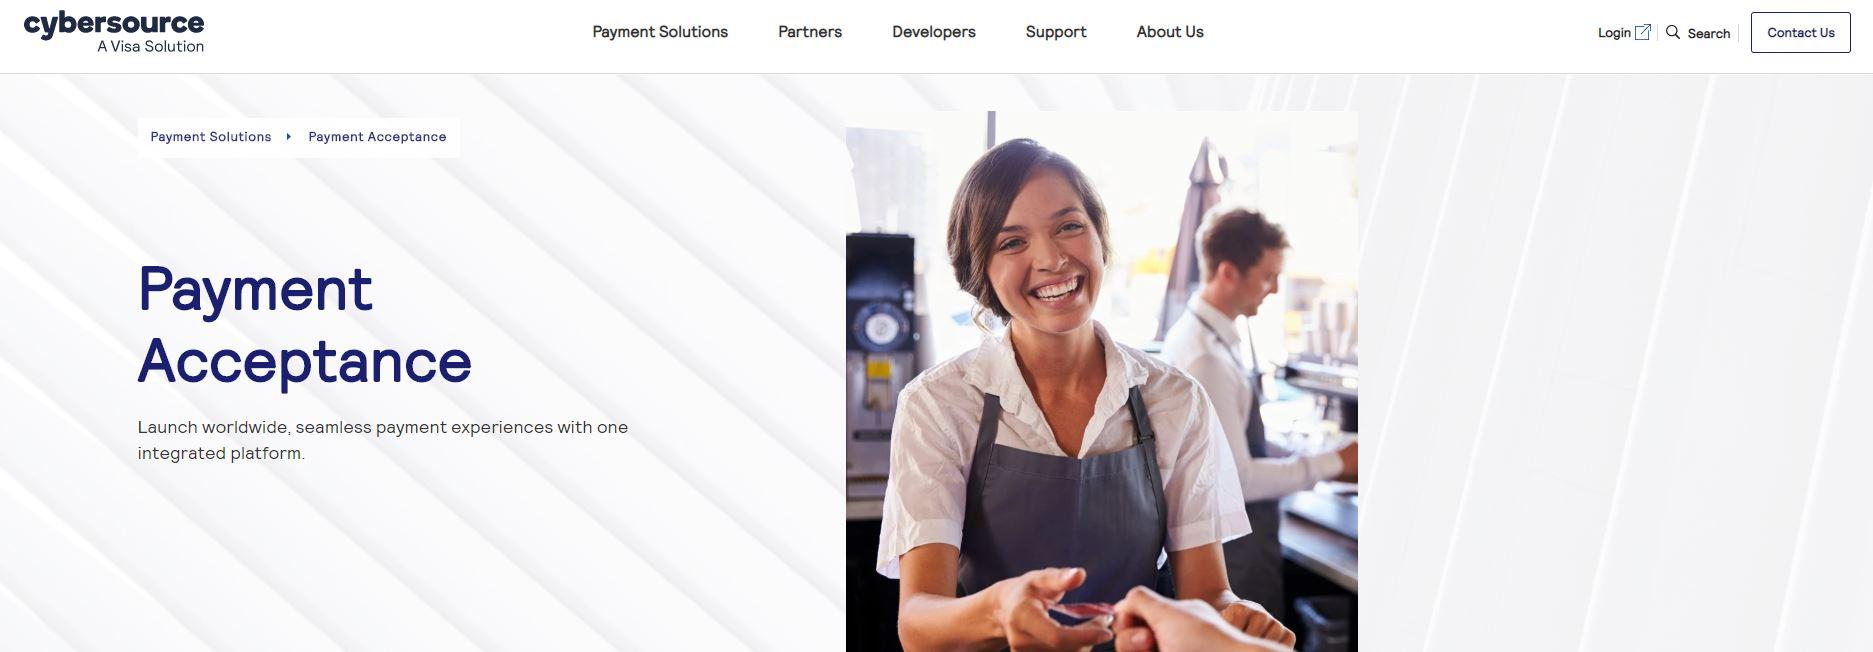 Cybersource website